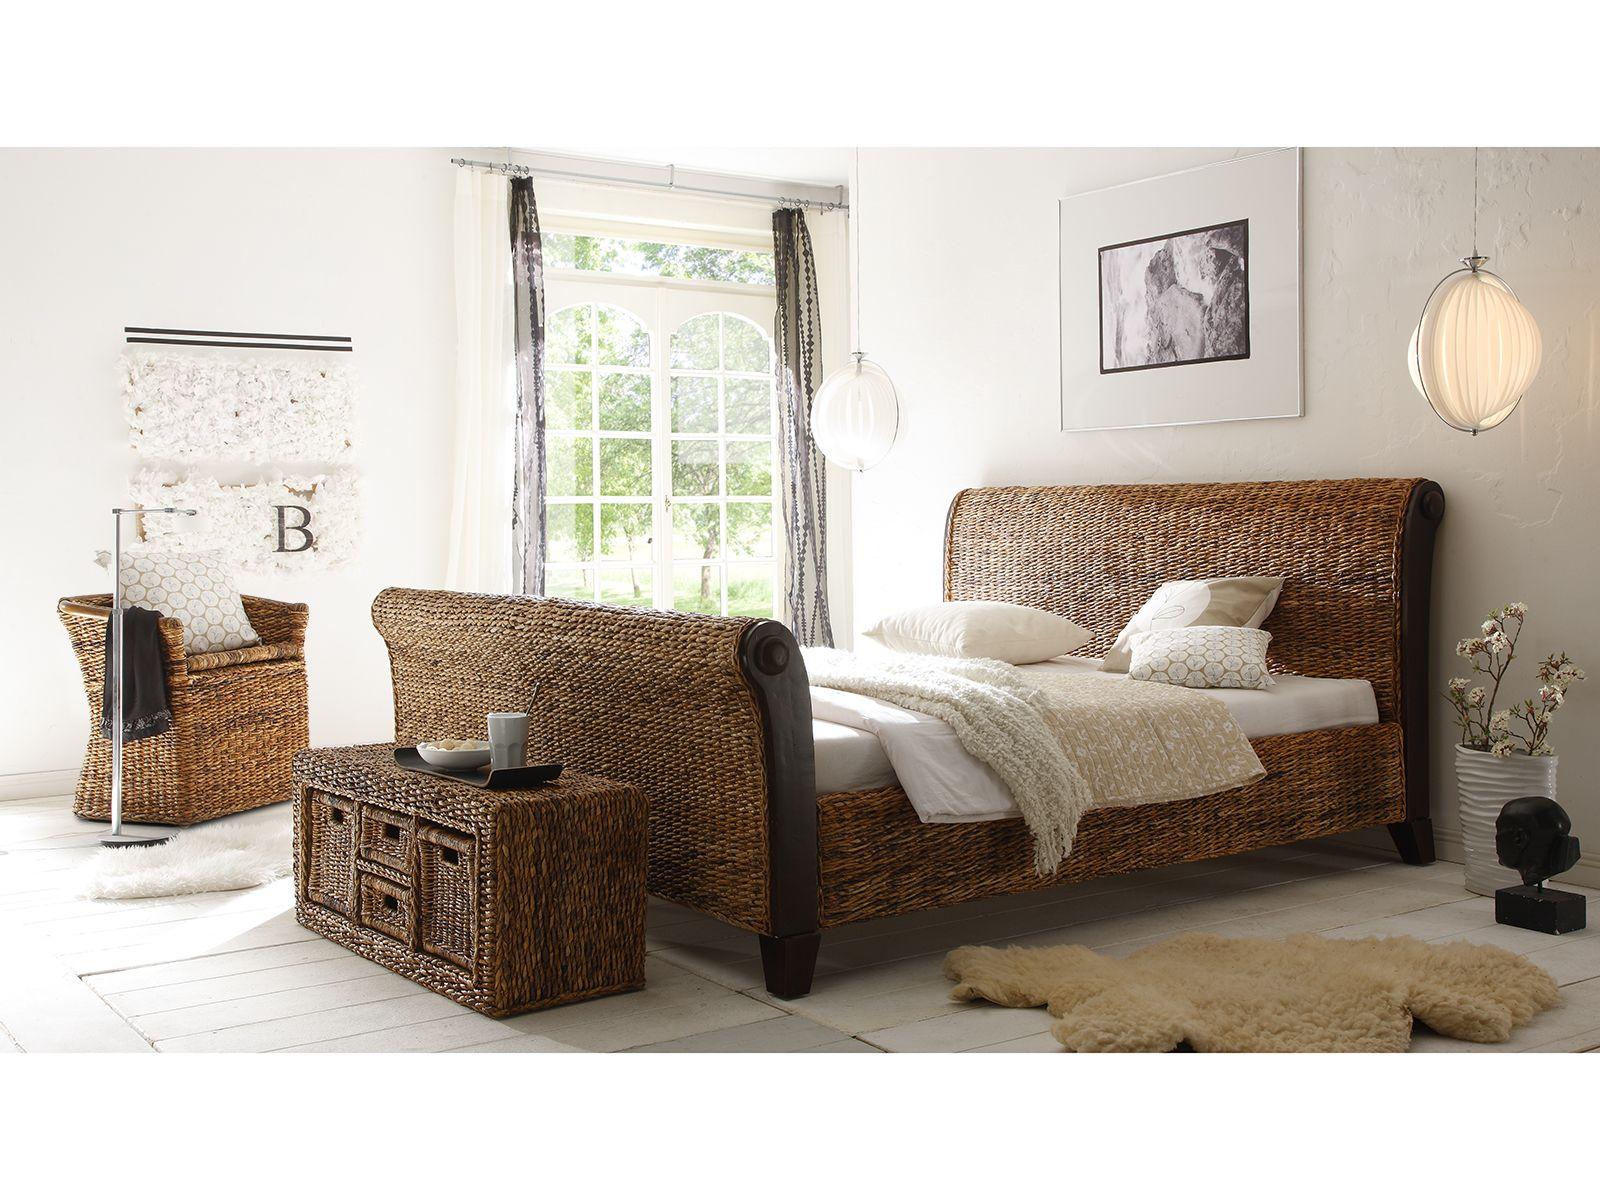 Rattanbett camillo by massivum schlafzimmer einrichtungsideen pinterest einrichtungsideen - Rattan schlafzimmer ...